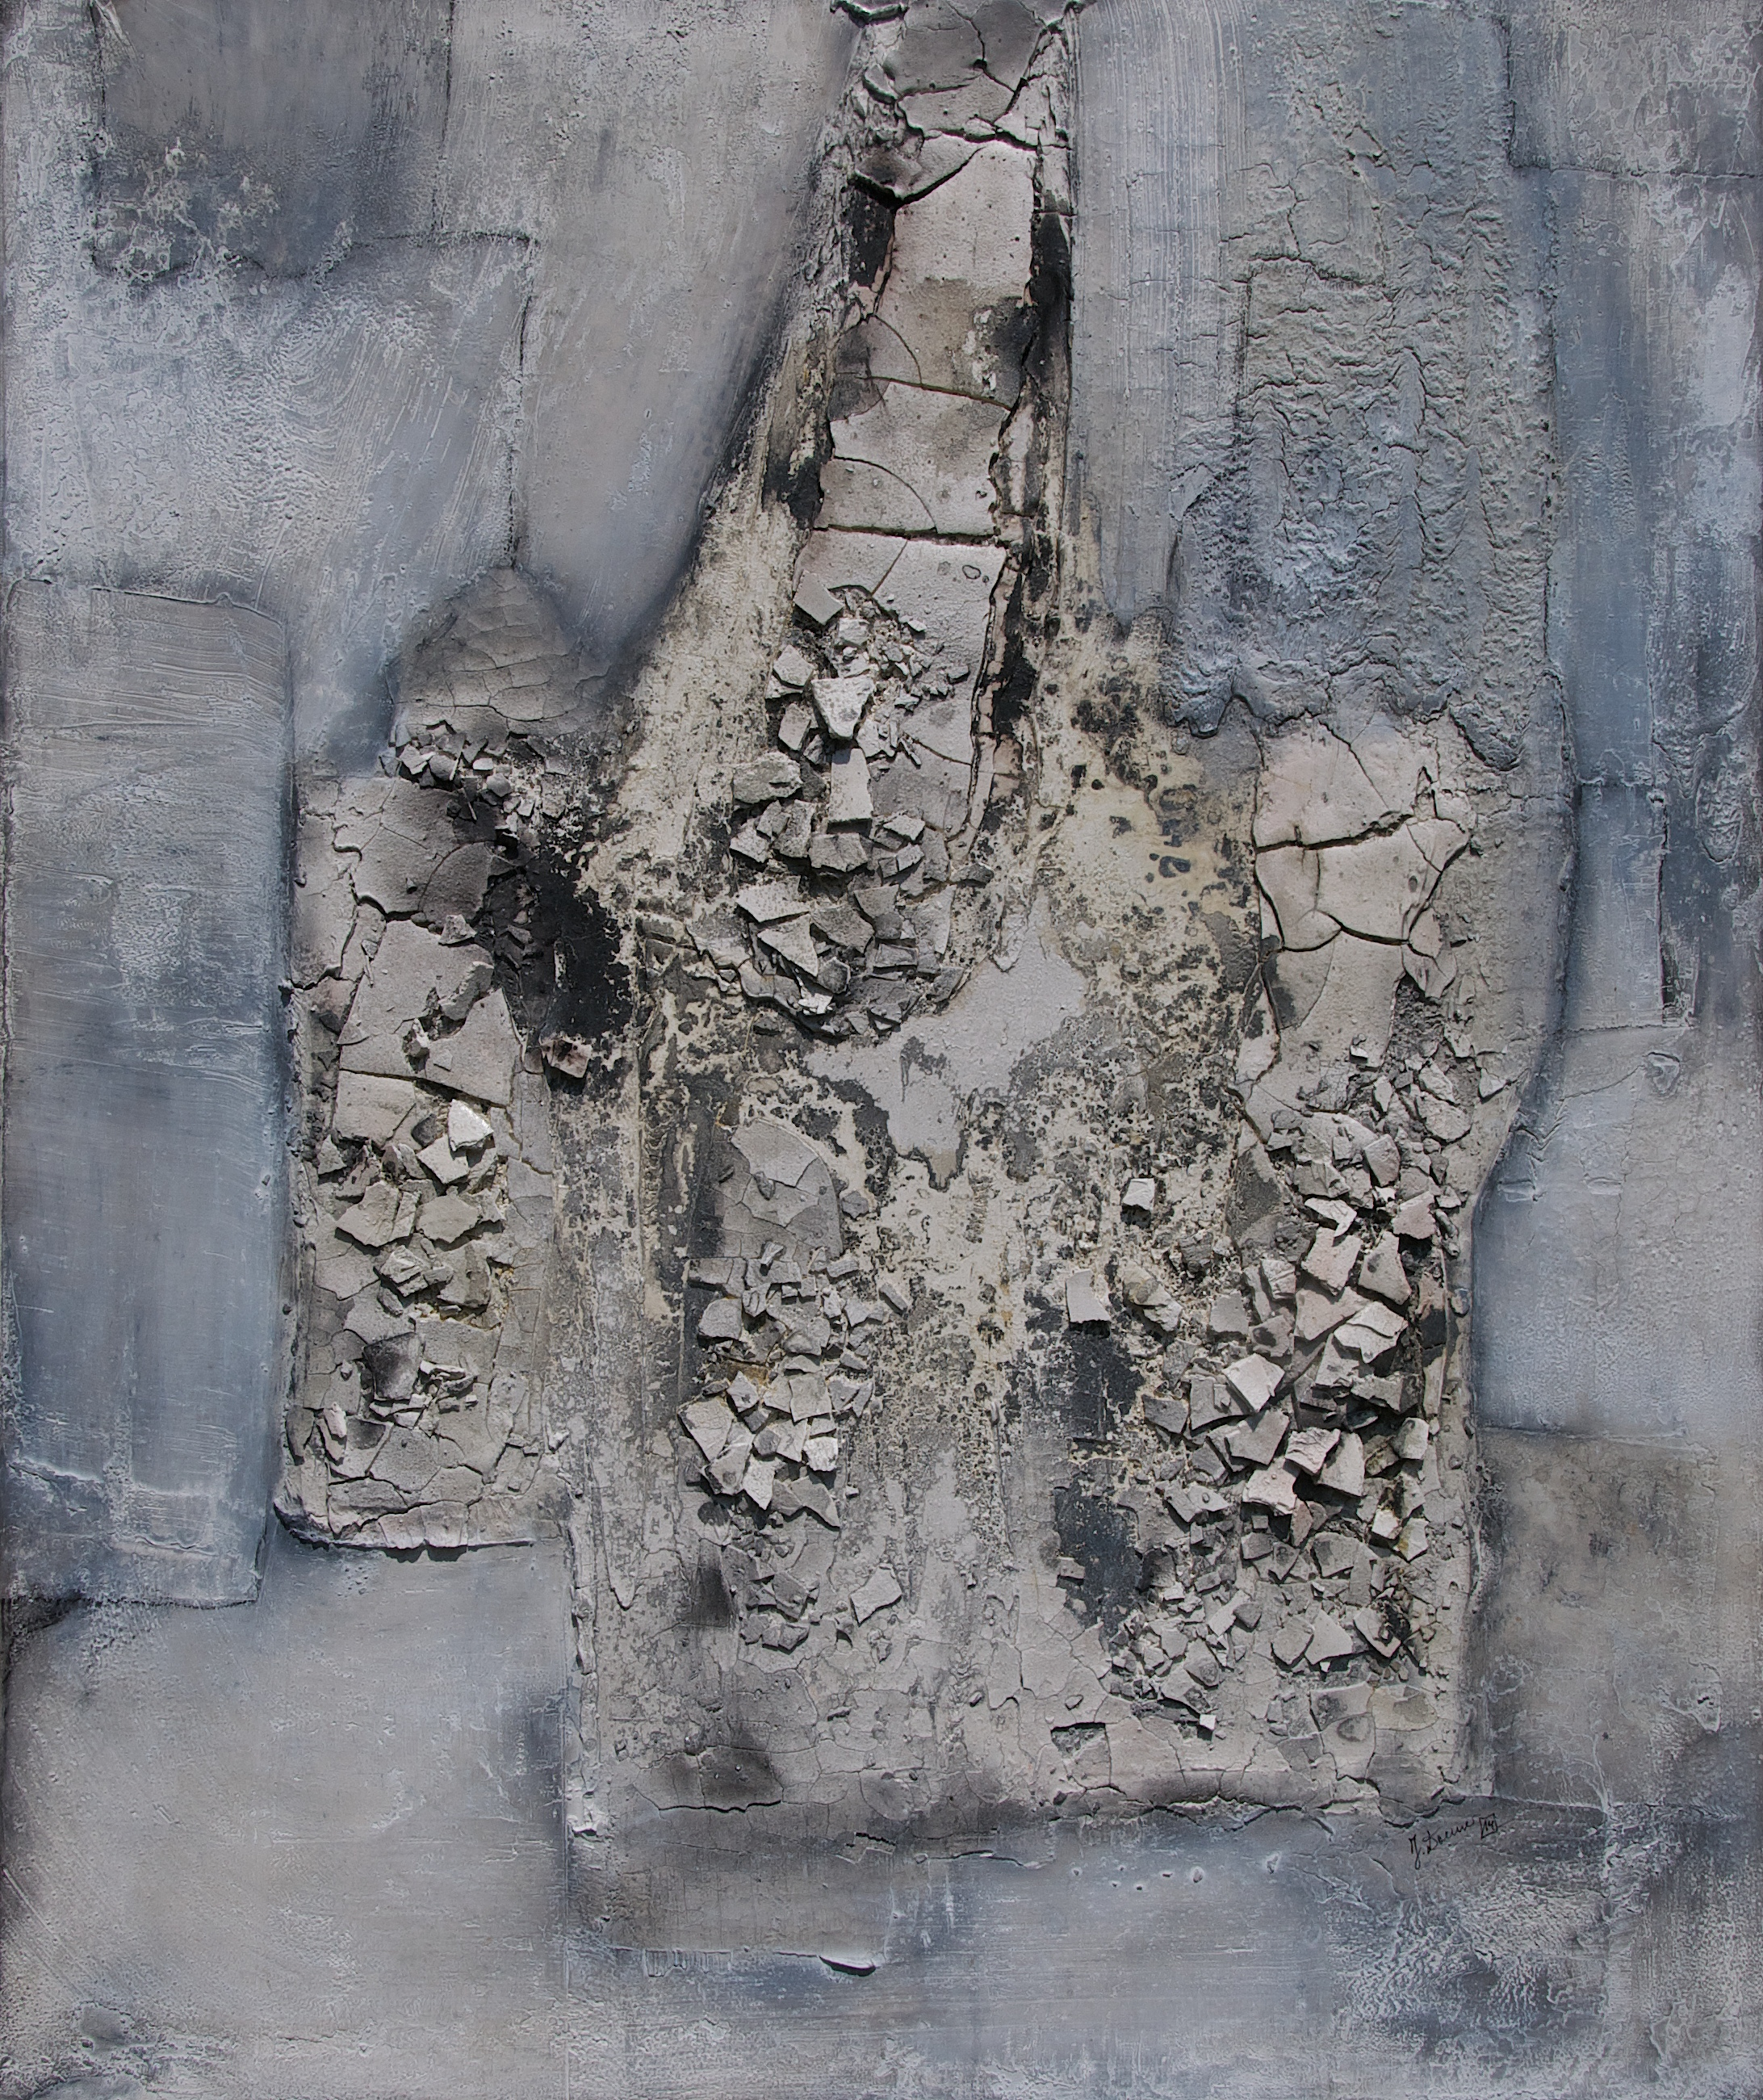 Leinwand_Marmormehl_Sumpfkalk_Pigmente_Kohle_Dispersionsbinder_ 120 x 100 cm